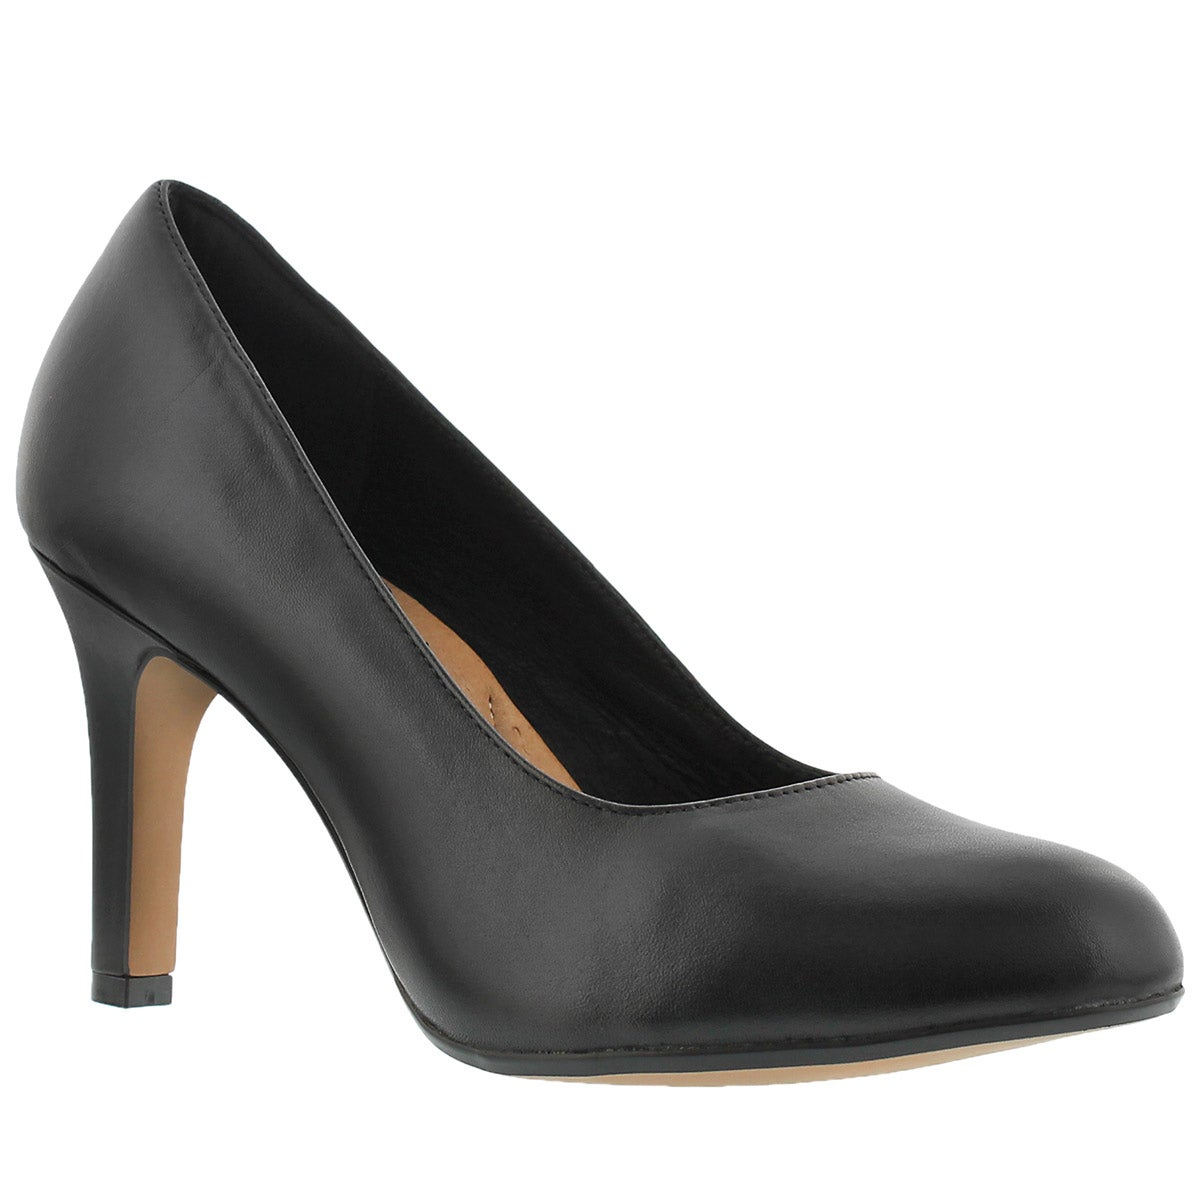 Lds Heavenly Star black dress pump